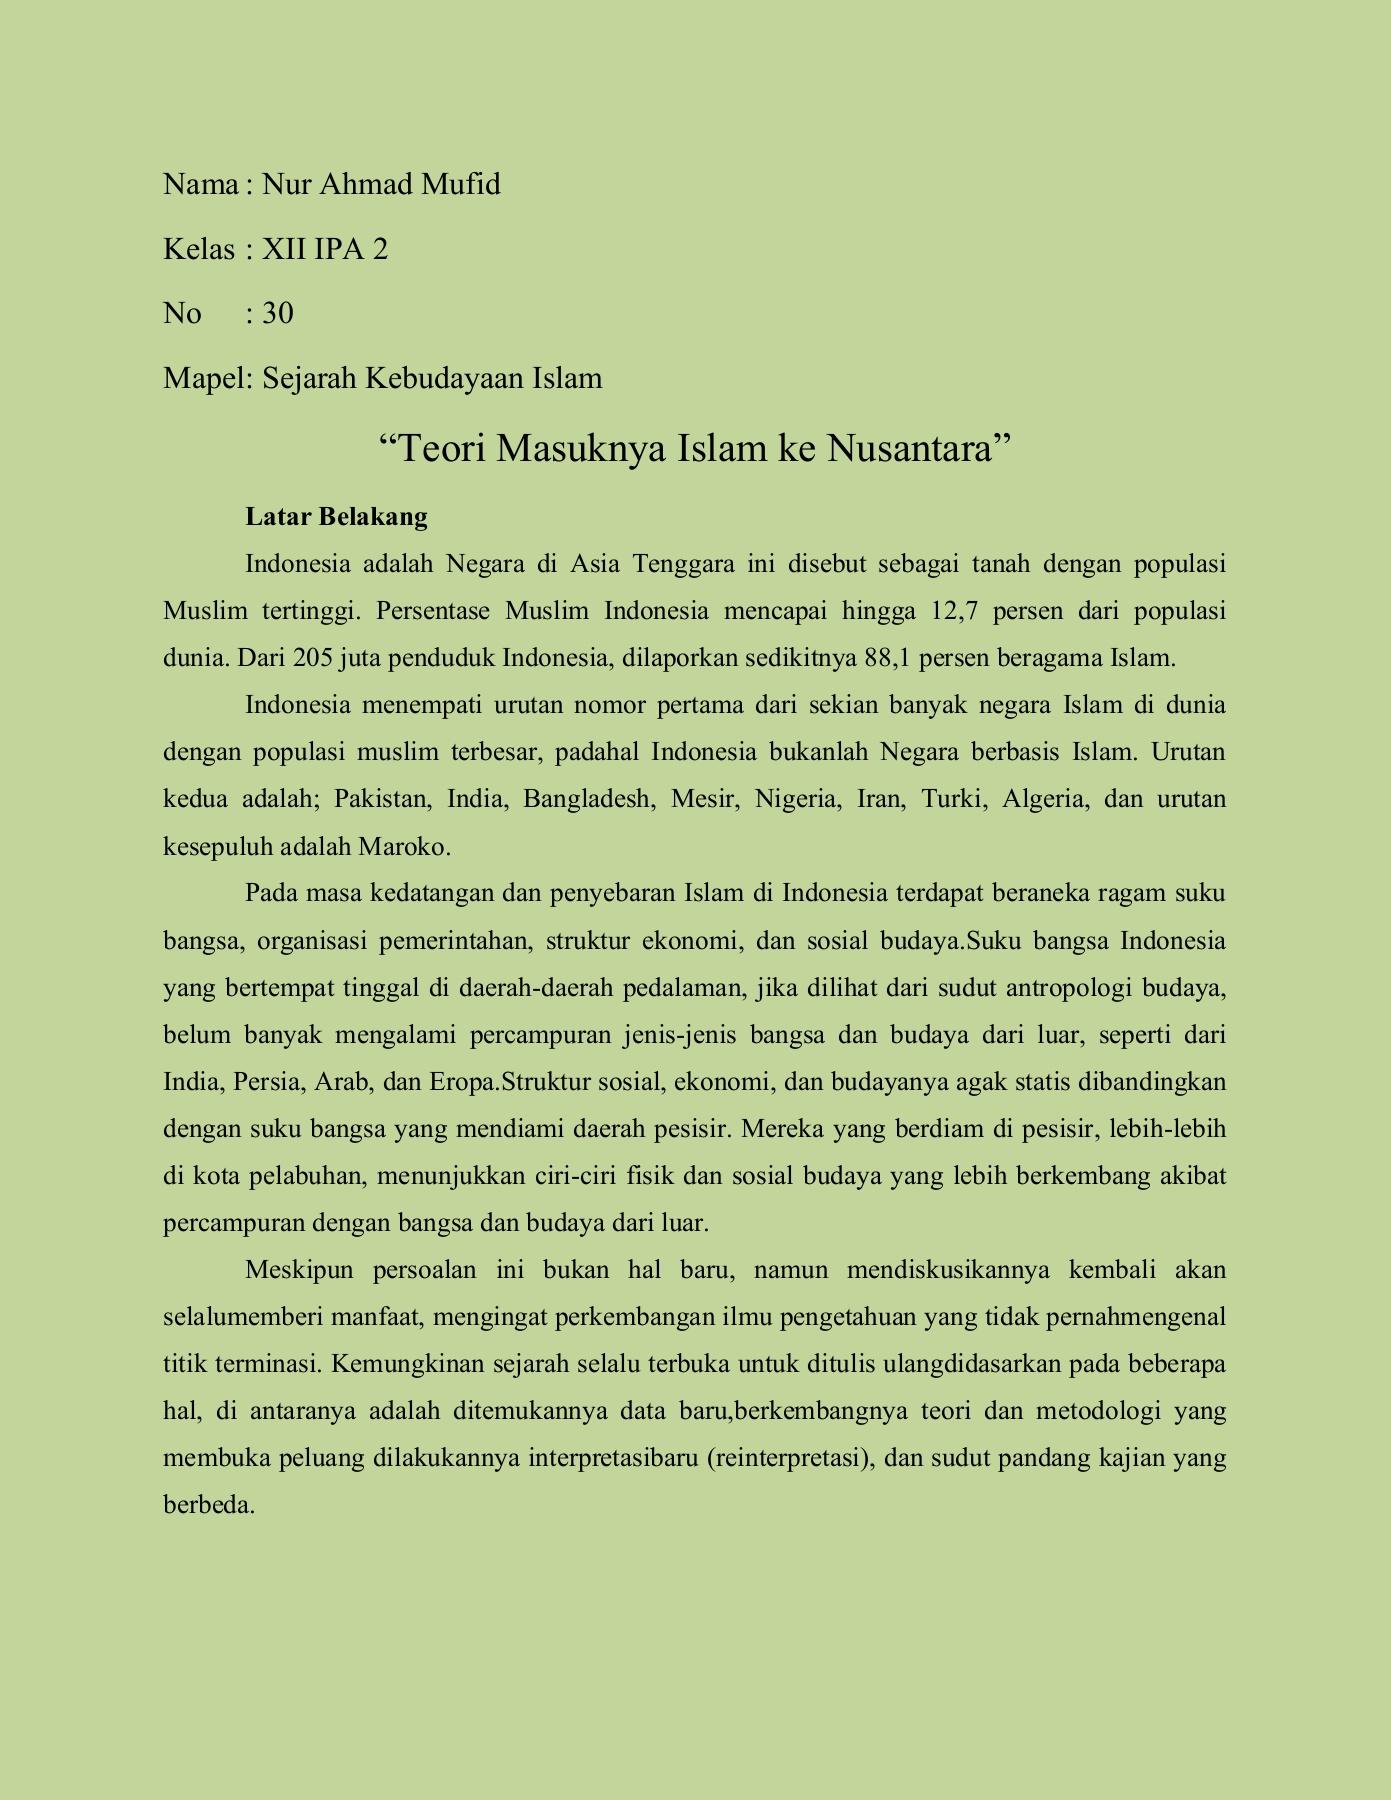 Teori Masuknya Agama Islam Di Indonesia : teori, masuknya, agama, islam, indonesia, (TEORI, MASUKNYA, ISLAM, INDONESIA), (30)-converted-Flip, EBook, Pages, AnyFlip